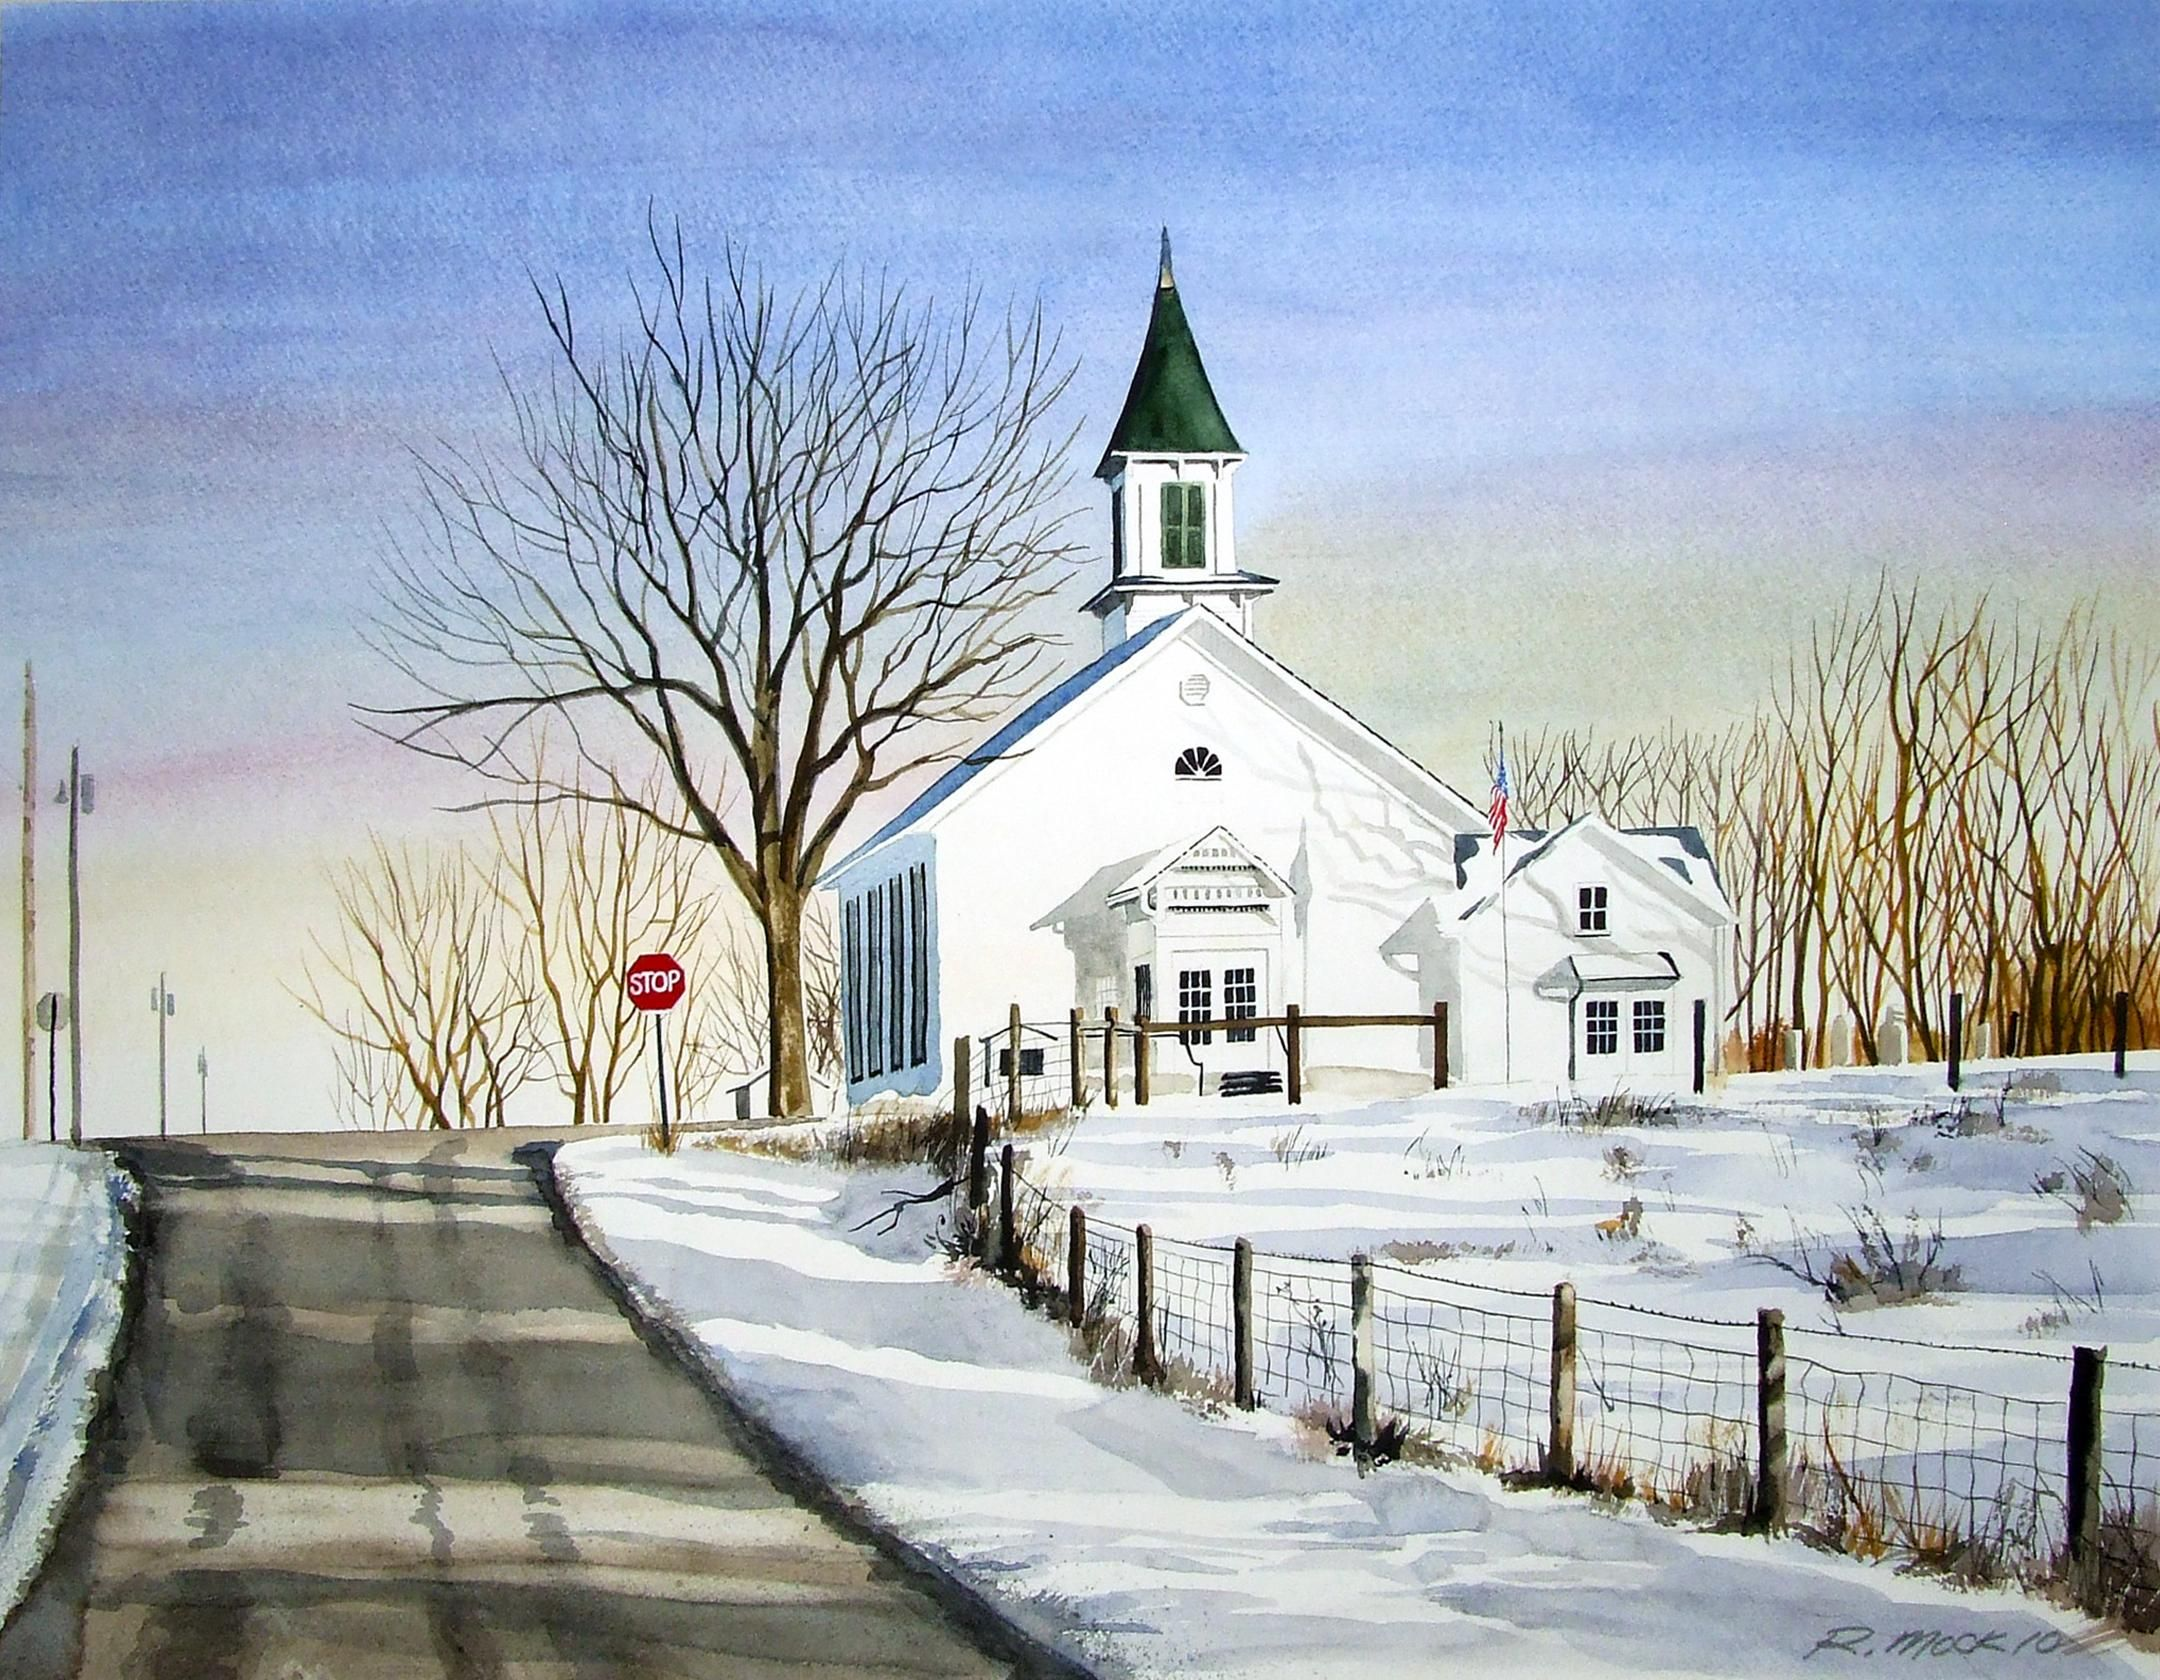 pin by ken mensing on church stuff pinterest churches